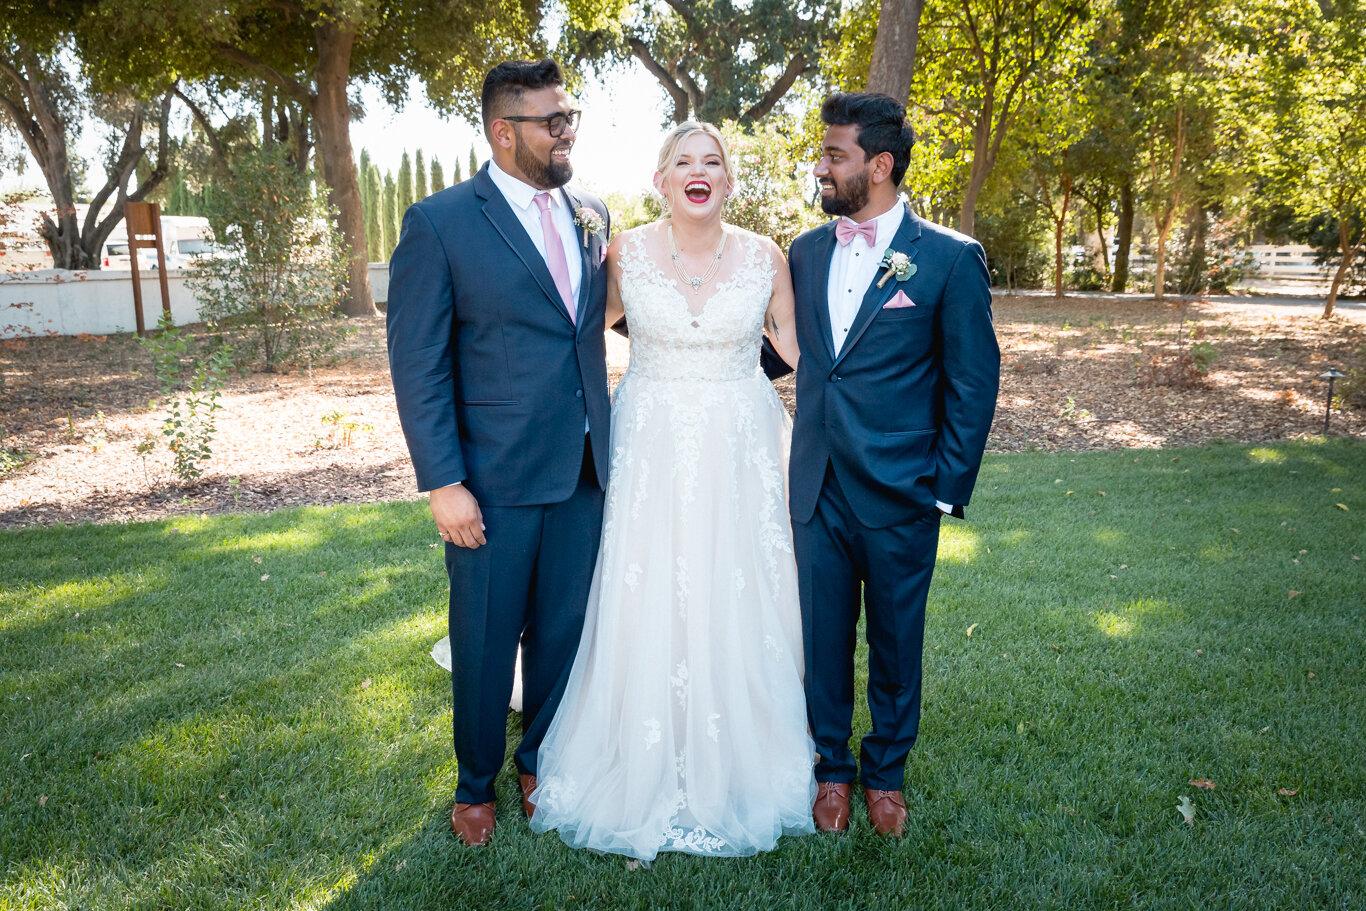 2019.08.24_Emily-Ashir-Wedding-at-the-Maples-5543.jpg